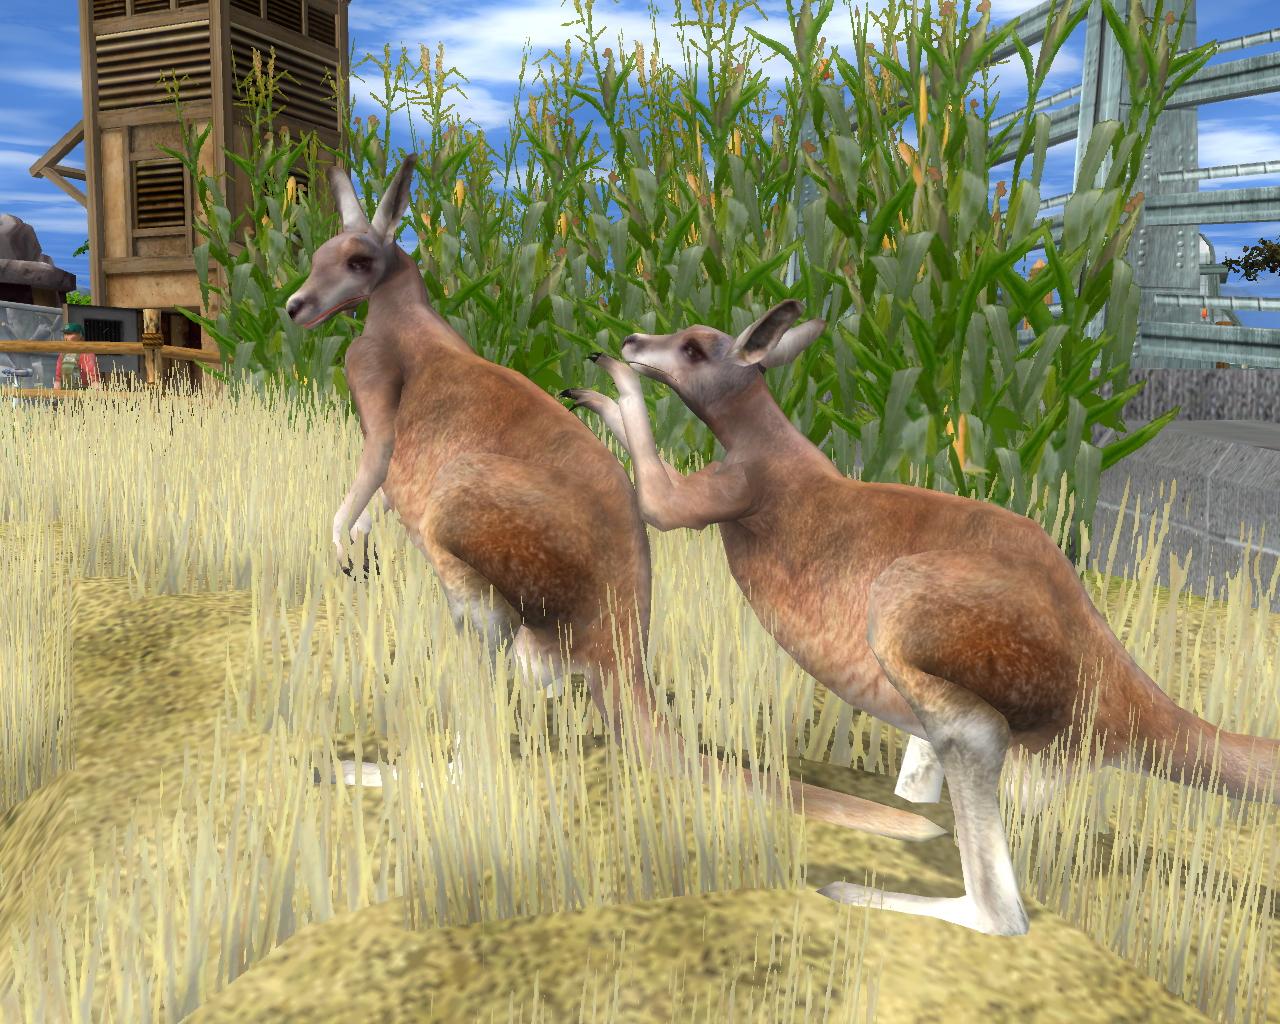 Wildlife Park 2 - Crazy Zoo screenshot